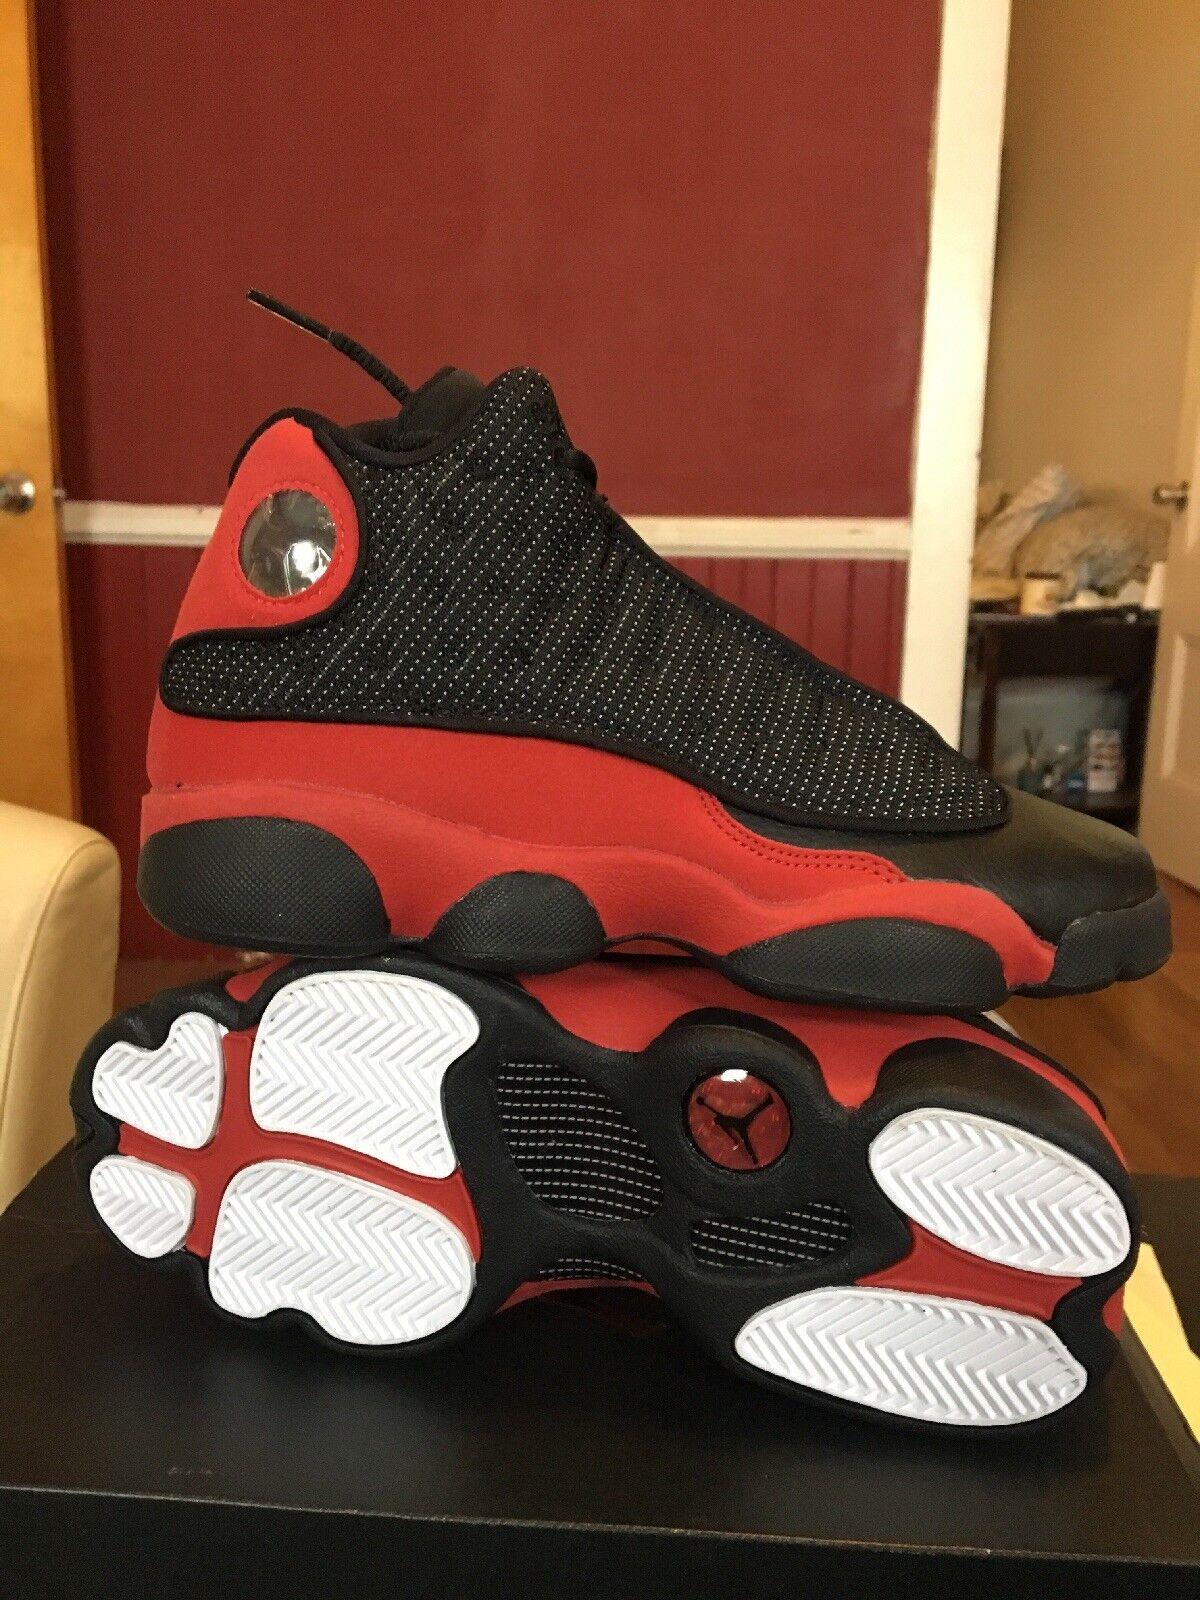 Jordan bred 13 size 5.5 GS